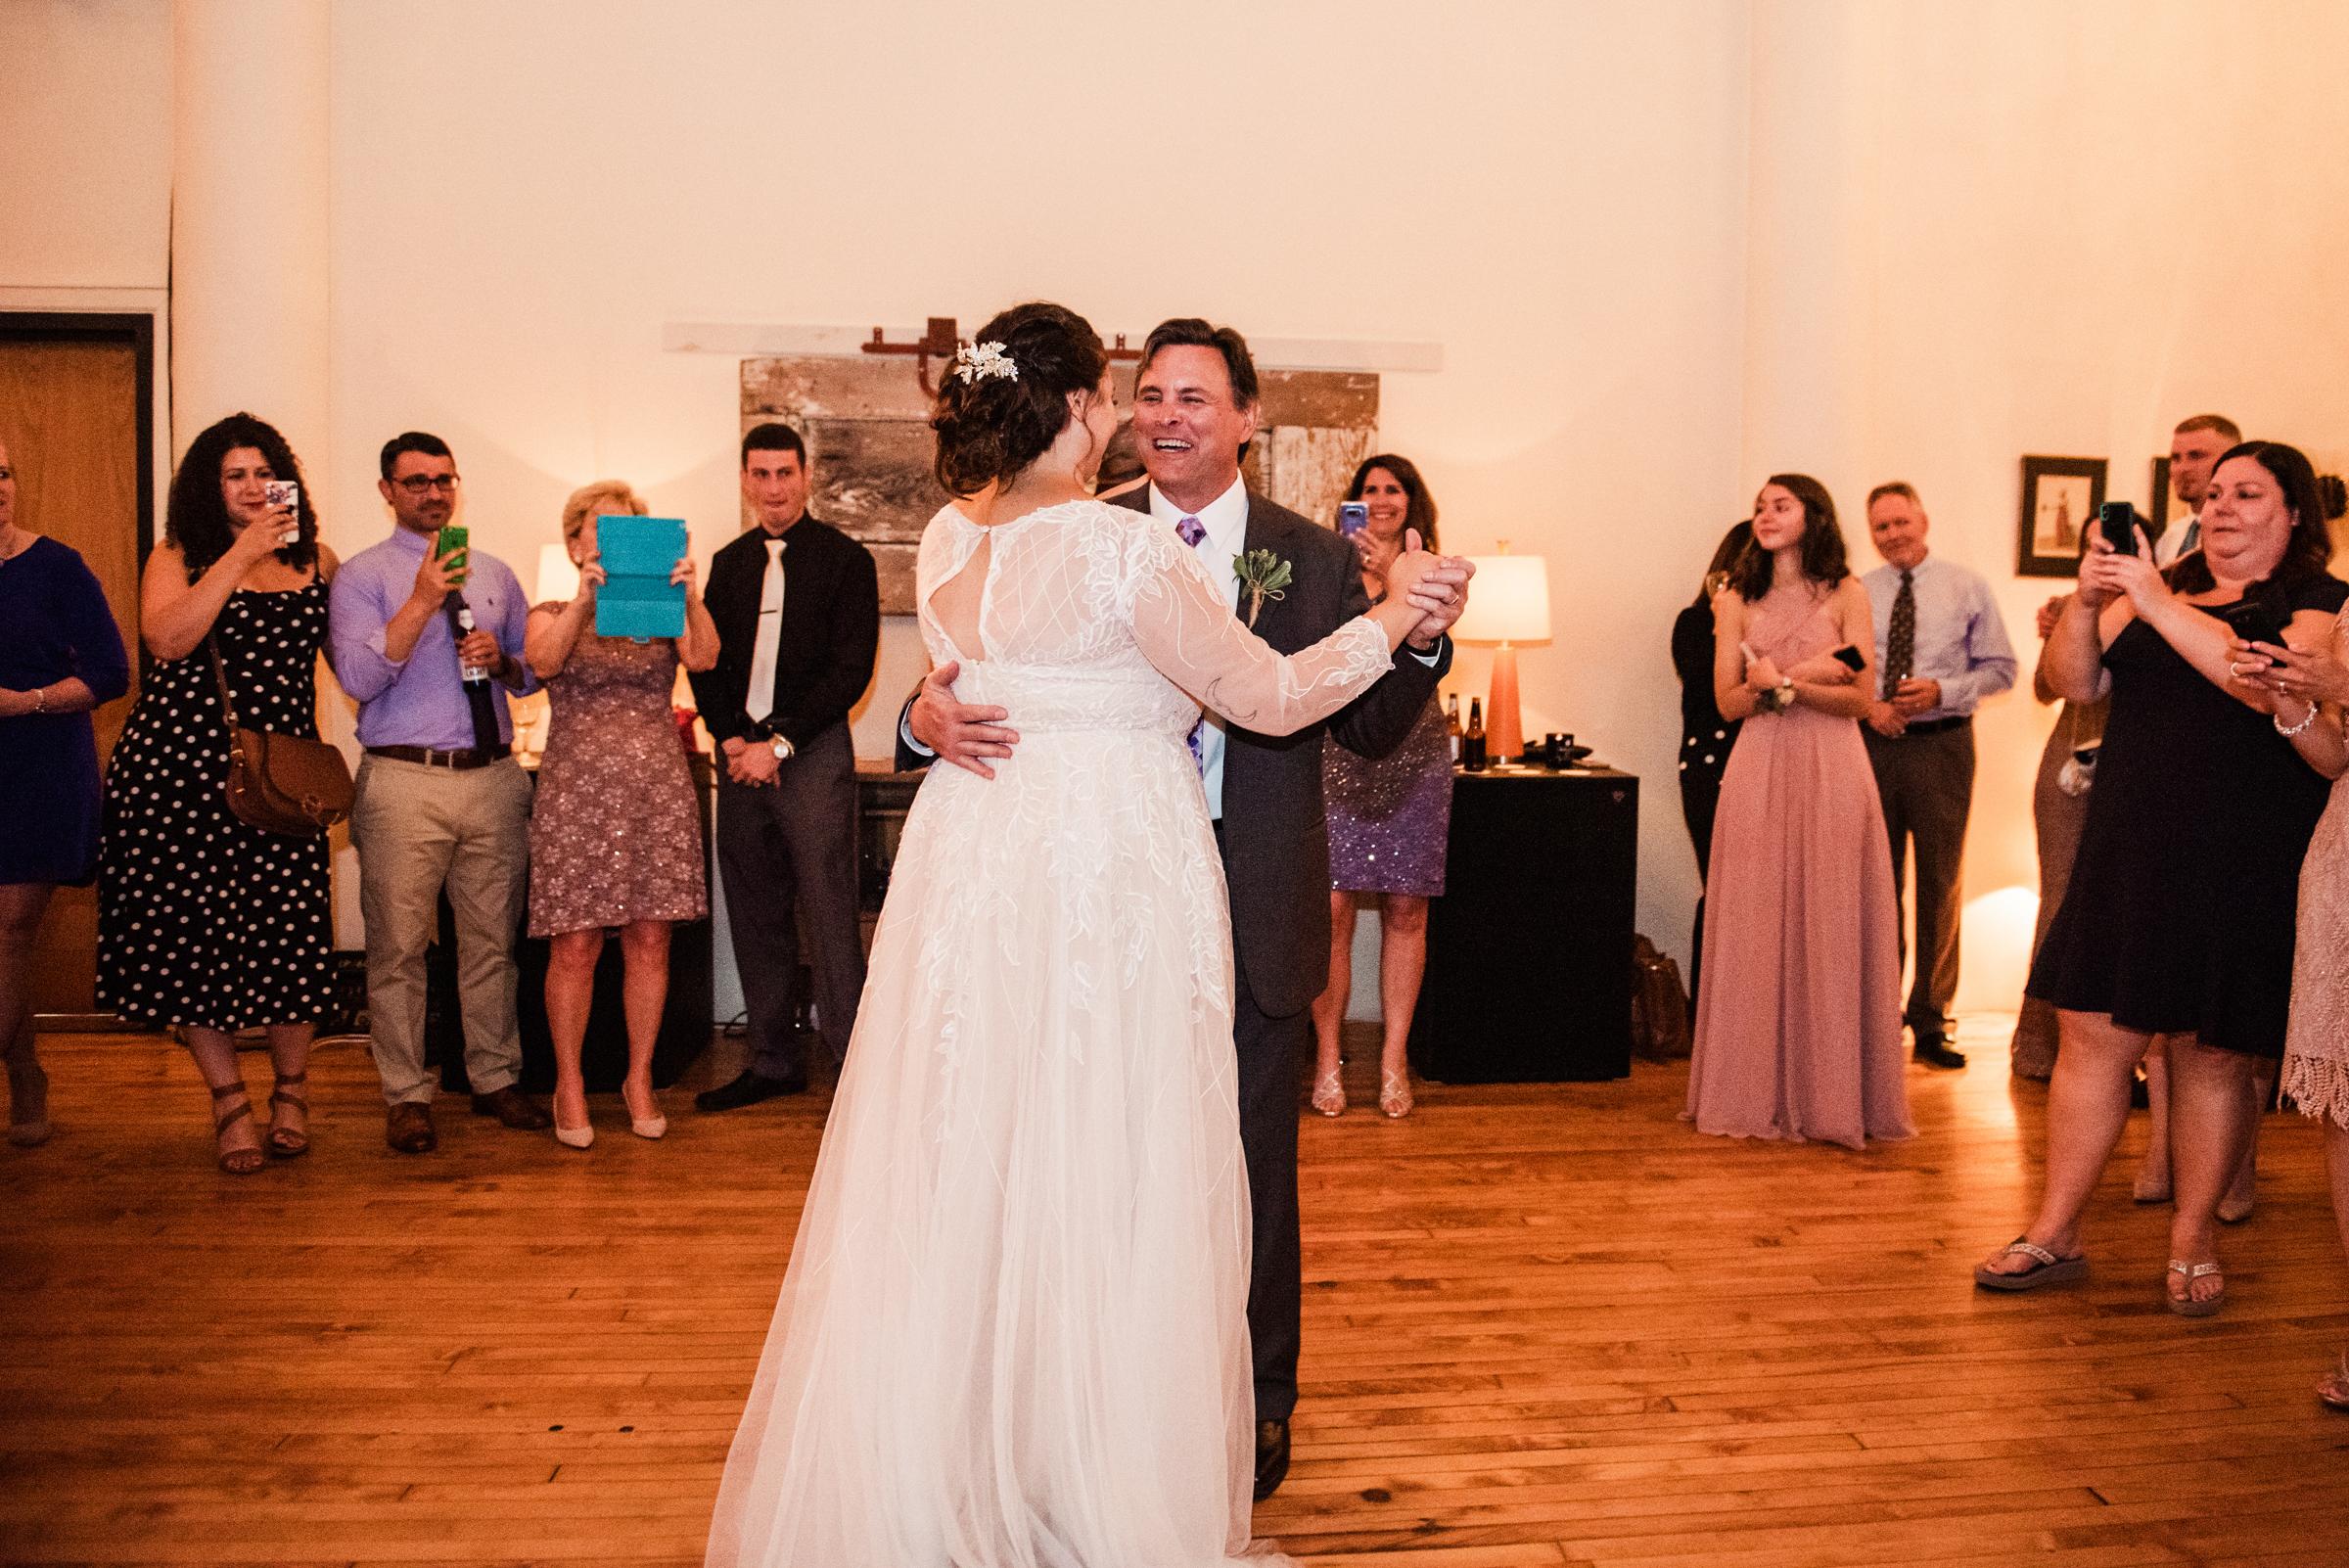 Studio_180_Lamberton_Conservatory_Rochester_Wedding_JILL_STUDIO_Rochester_NY_Photographer_DSC_9167.jpg